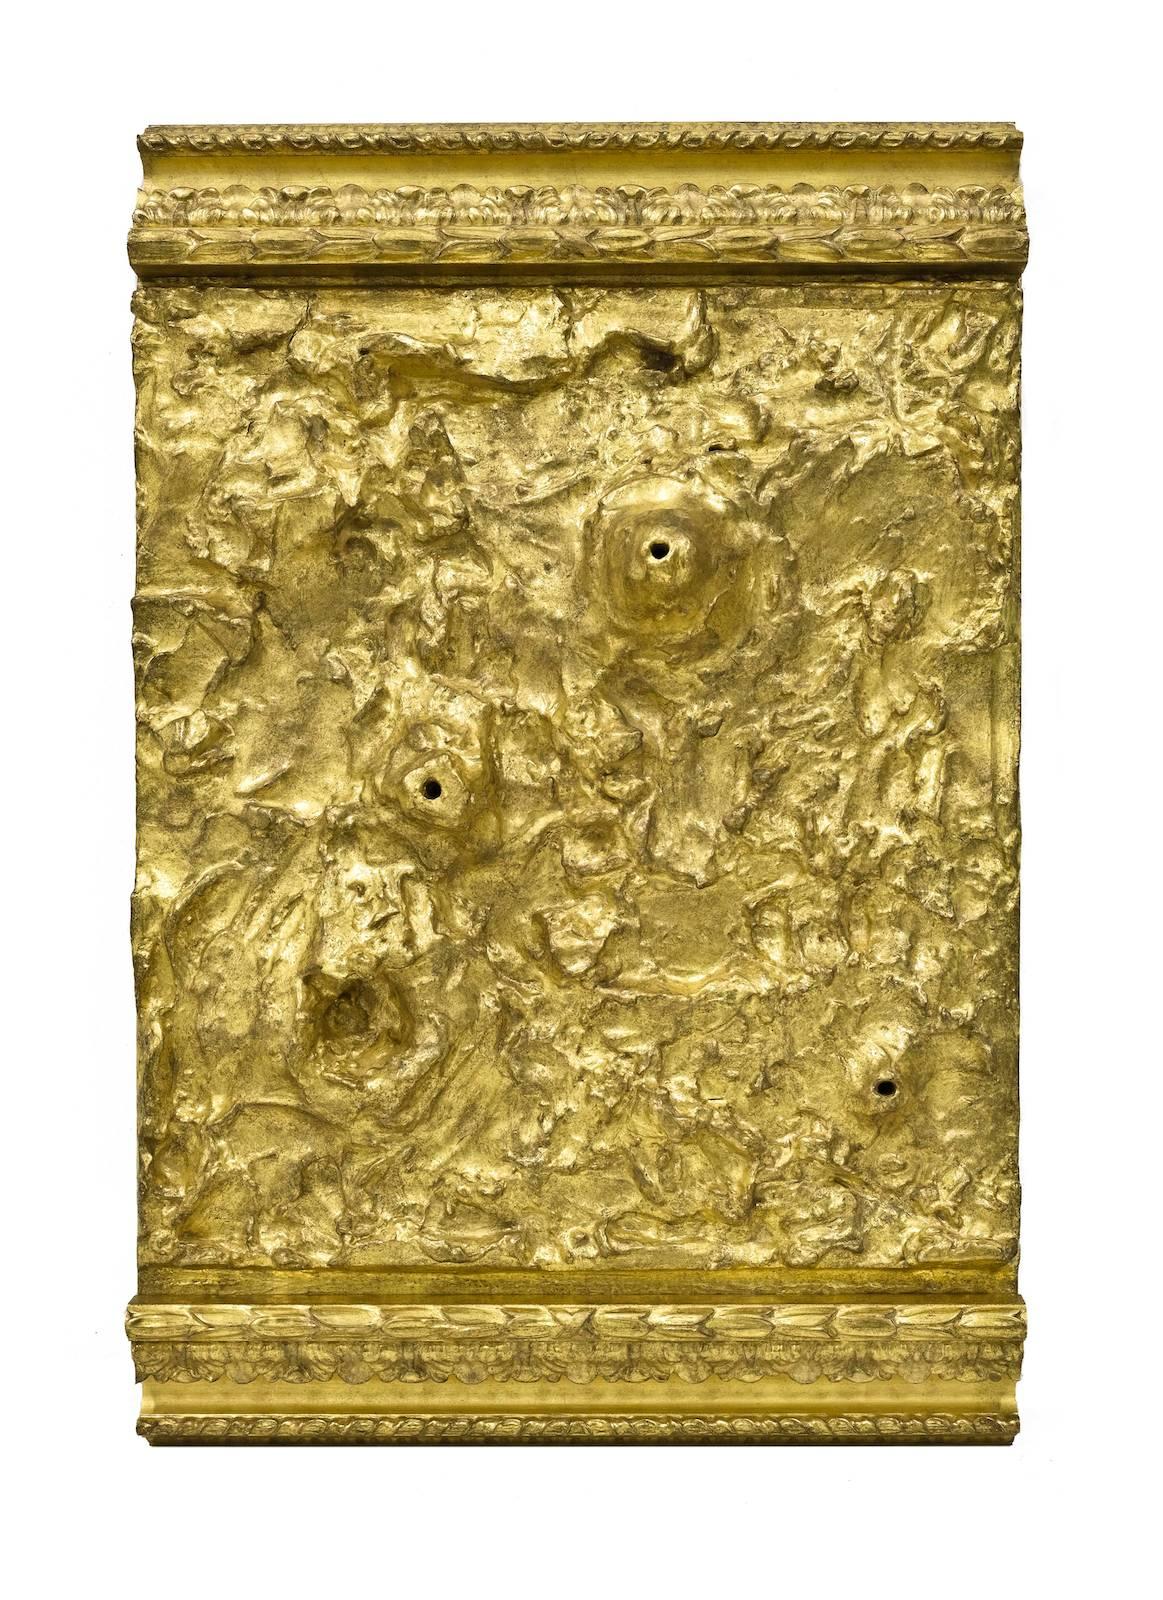 Untitled, 2017, wood, acrylic paste, gold leaf, 76 x 50 x 17,5 cm